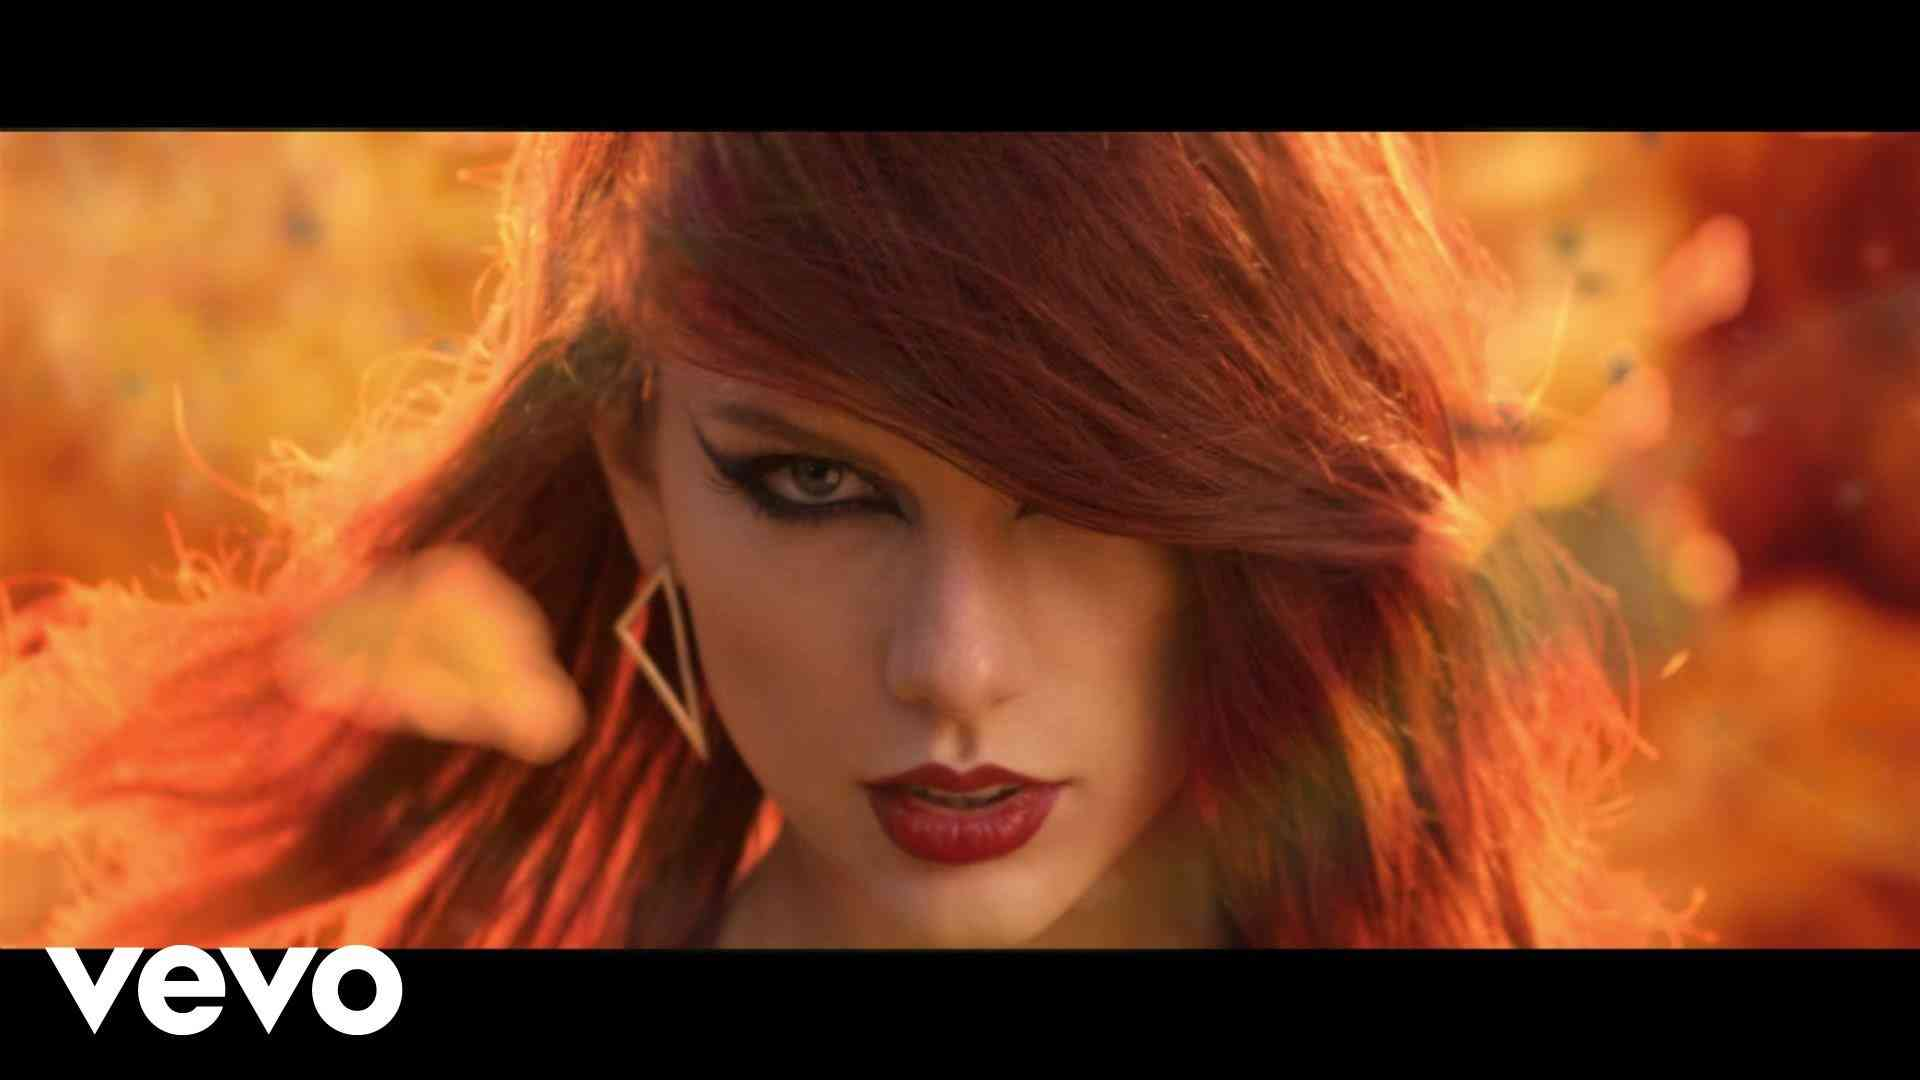 Taylor Swift - Bad Blood ft. Kendrick Lamar - YouTube